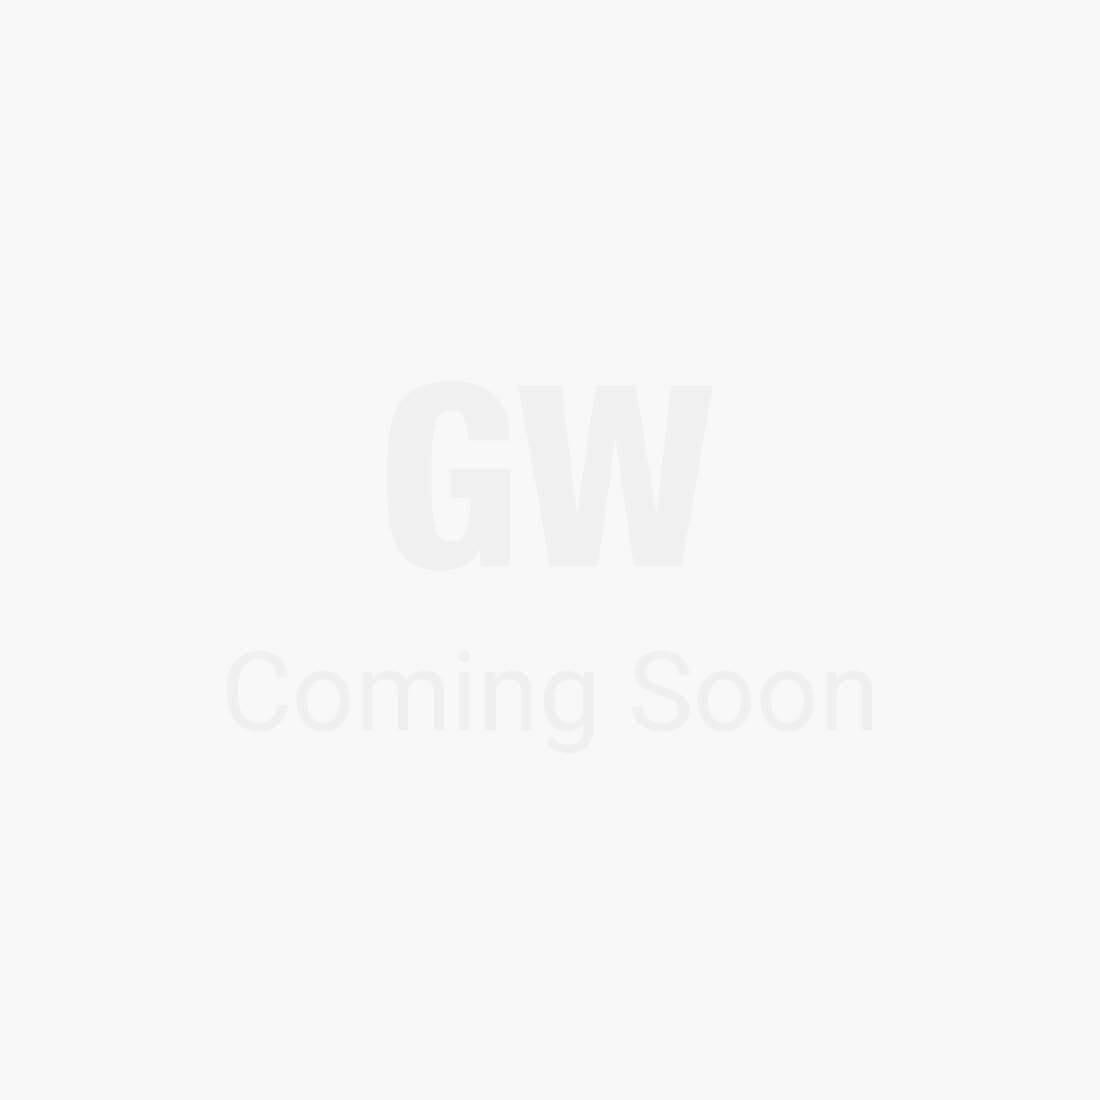 Hugo Square Cushion